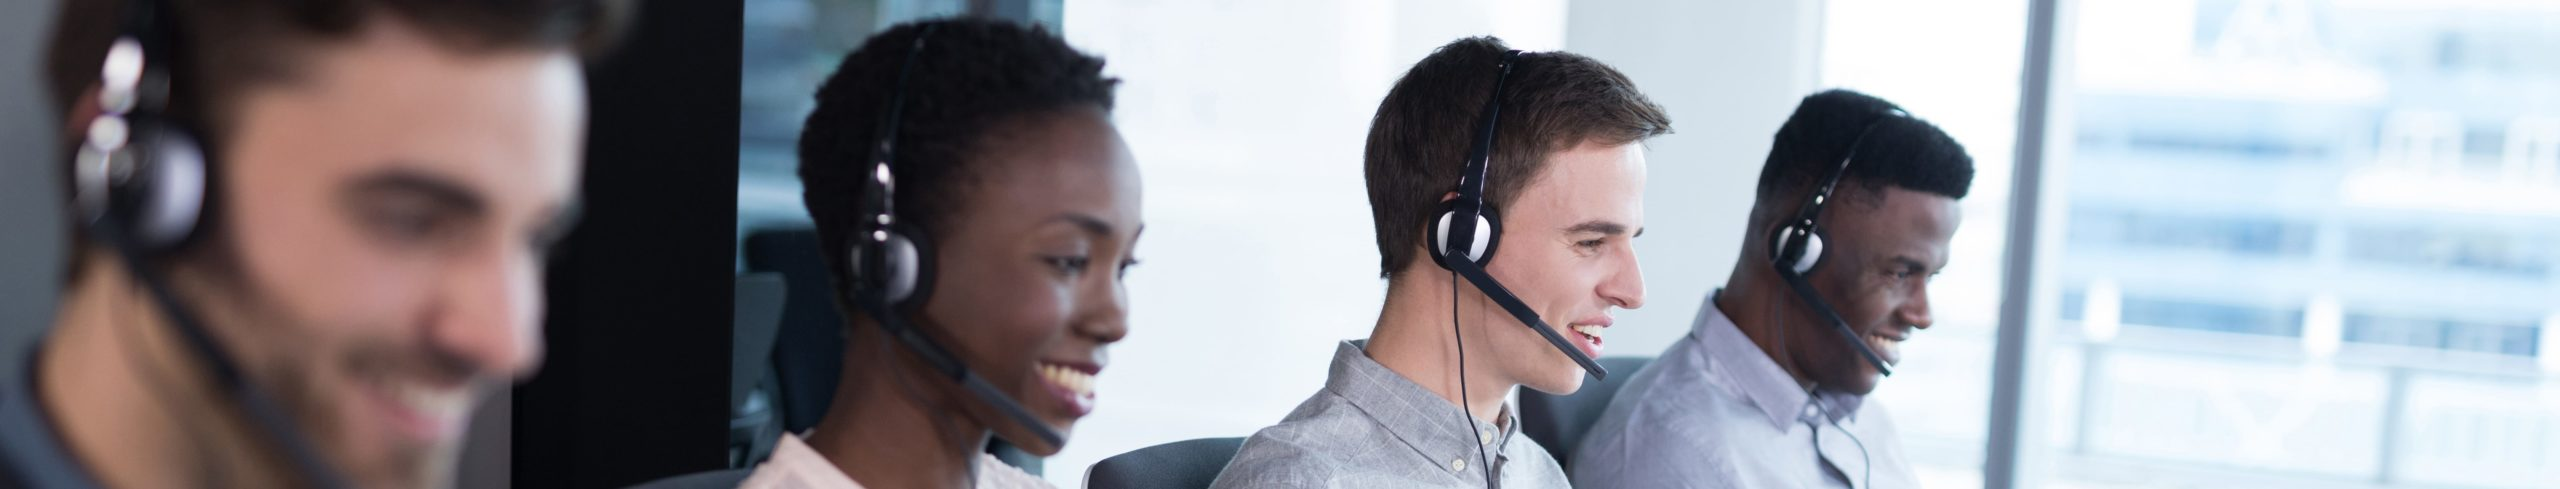 Customer Support for Aformance WLI Storage Solutions